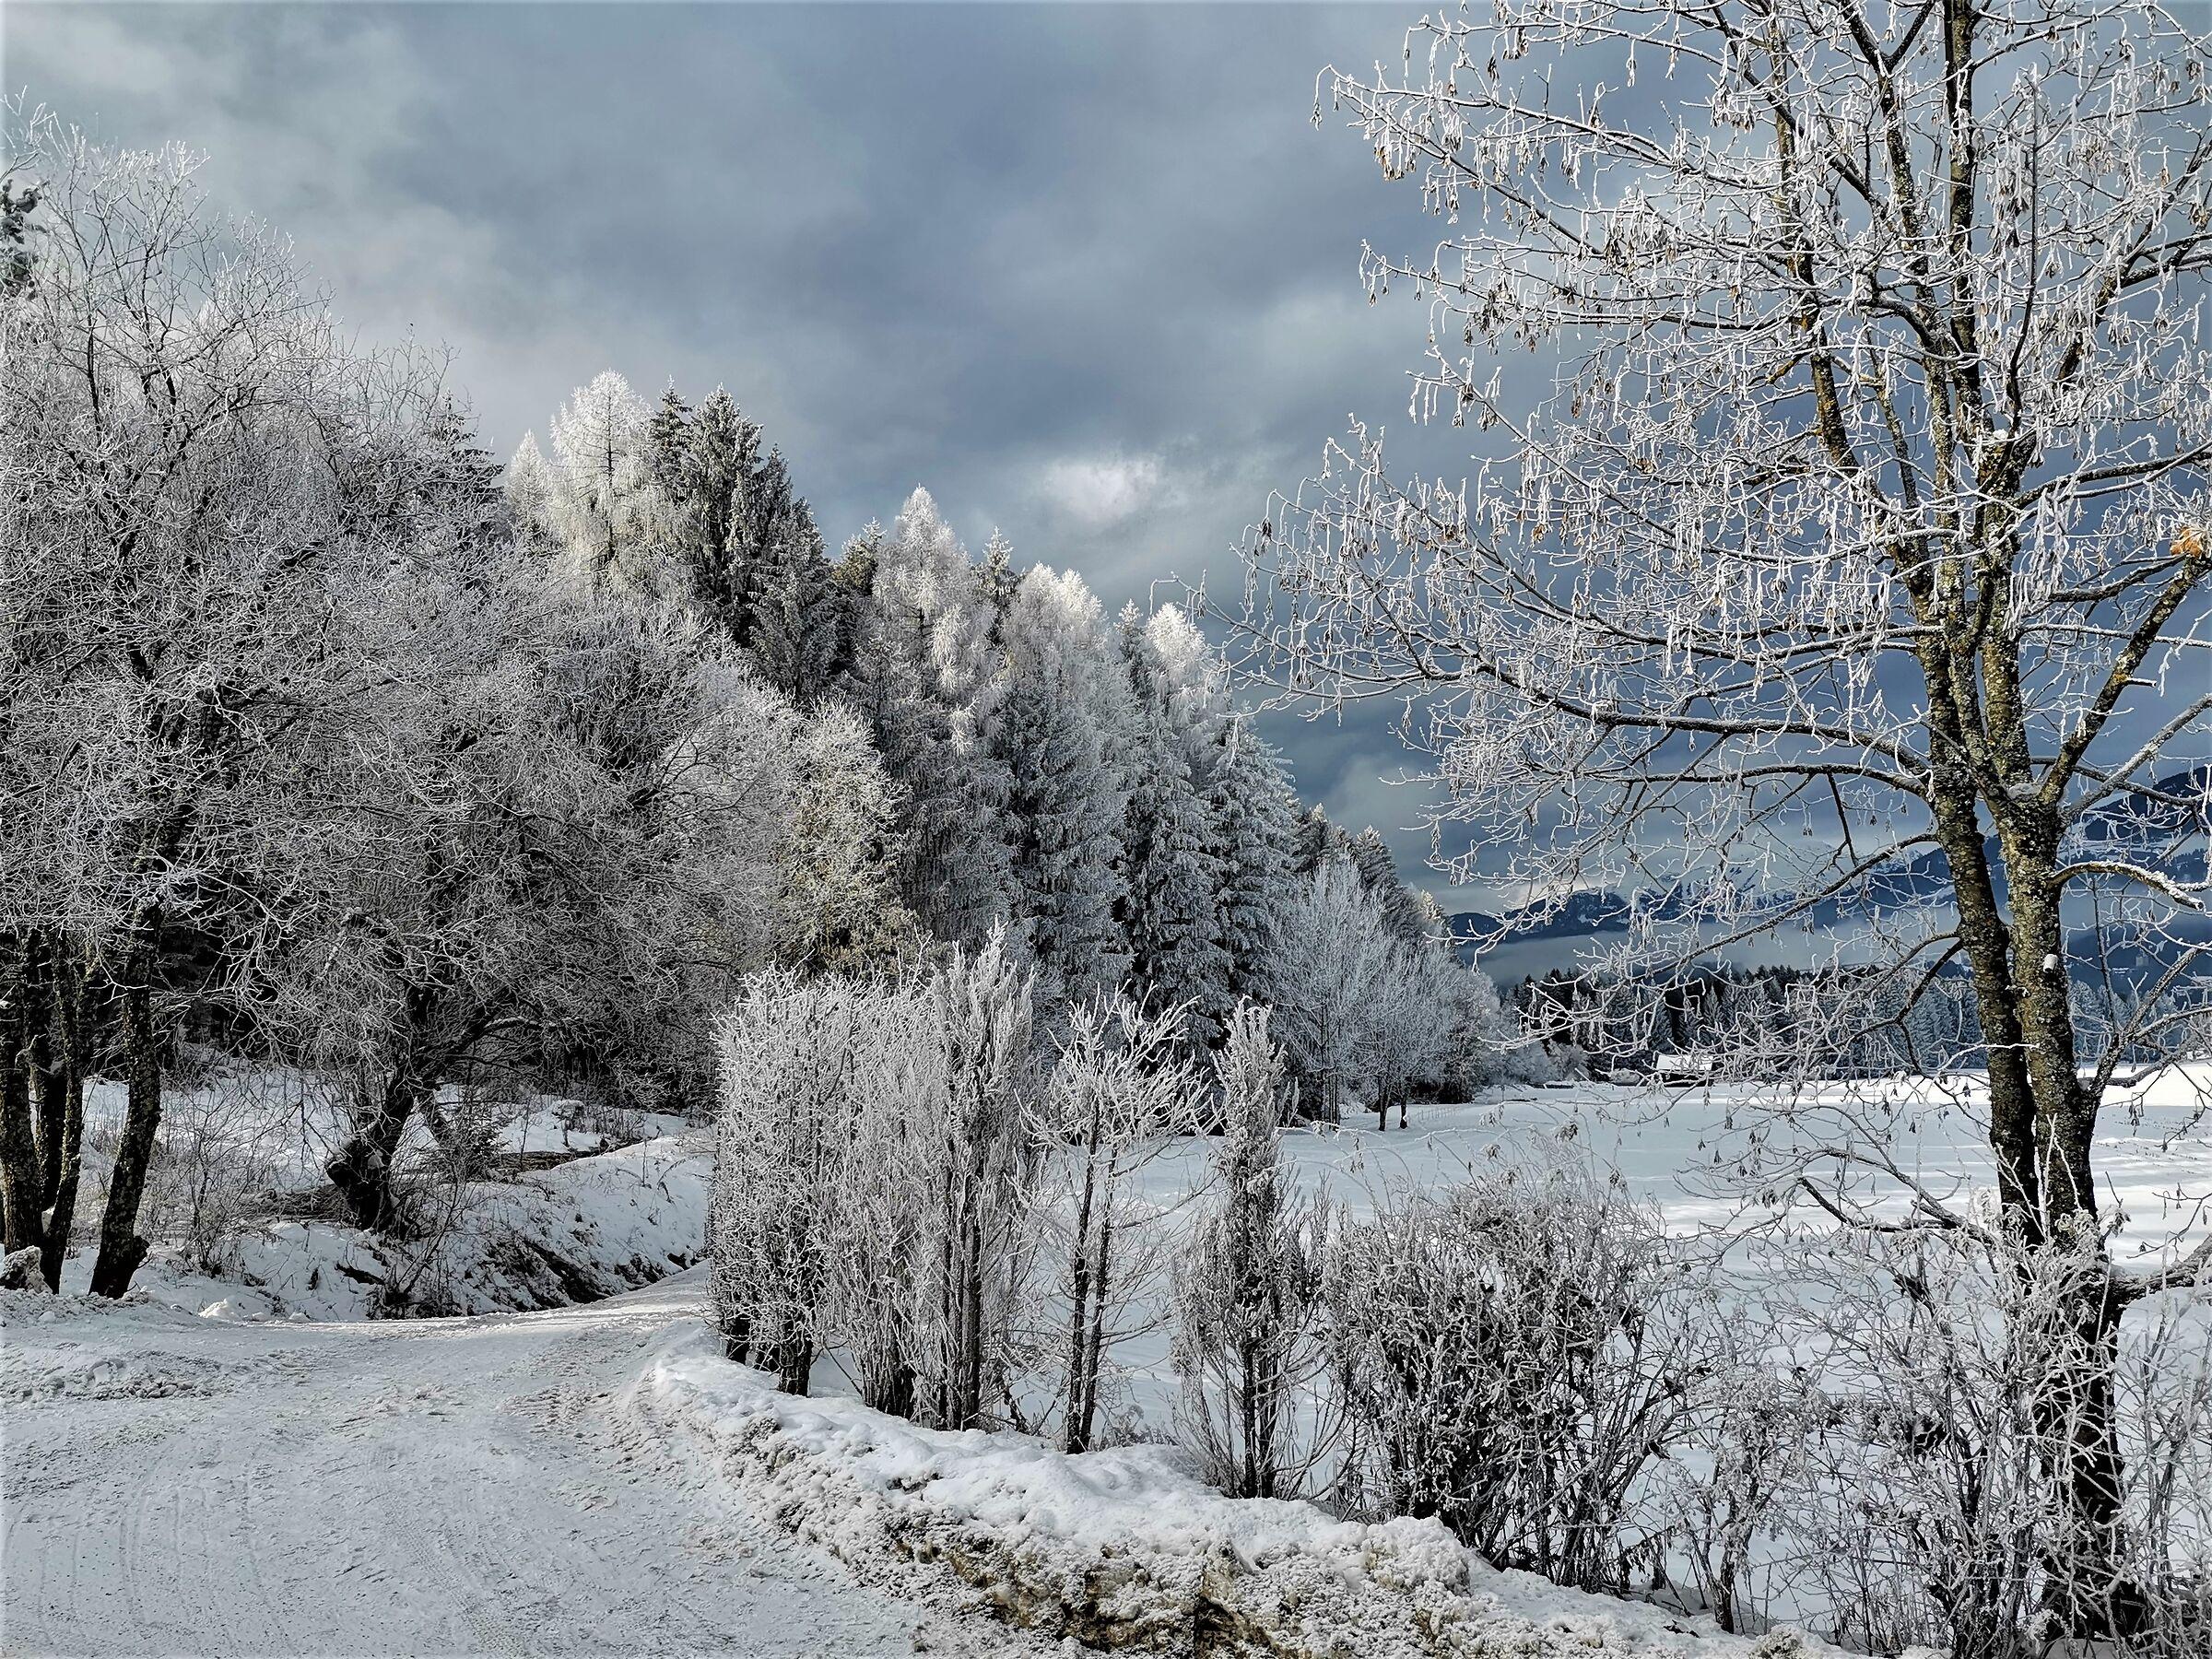 50 shades of Winter...